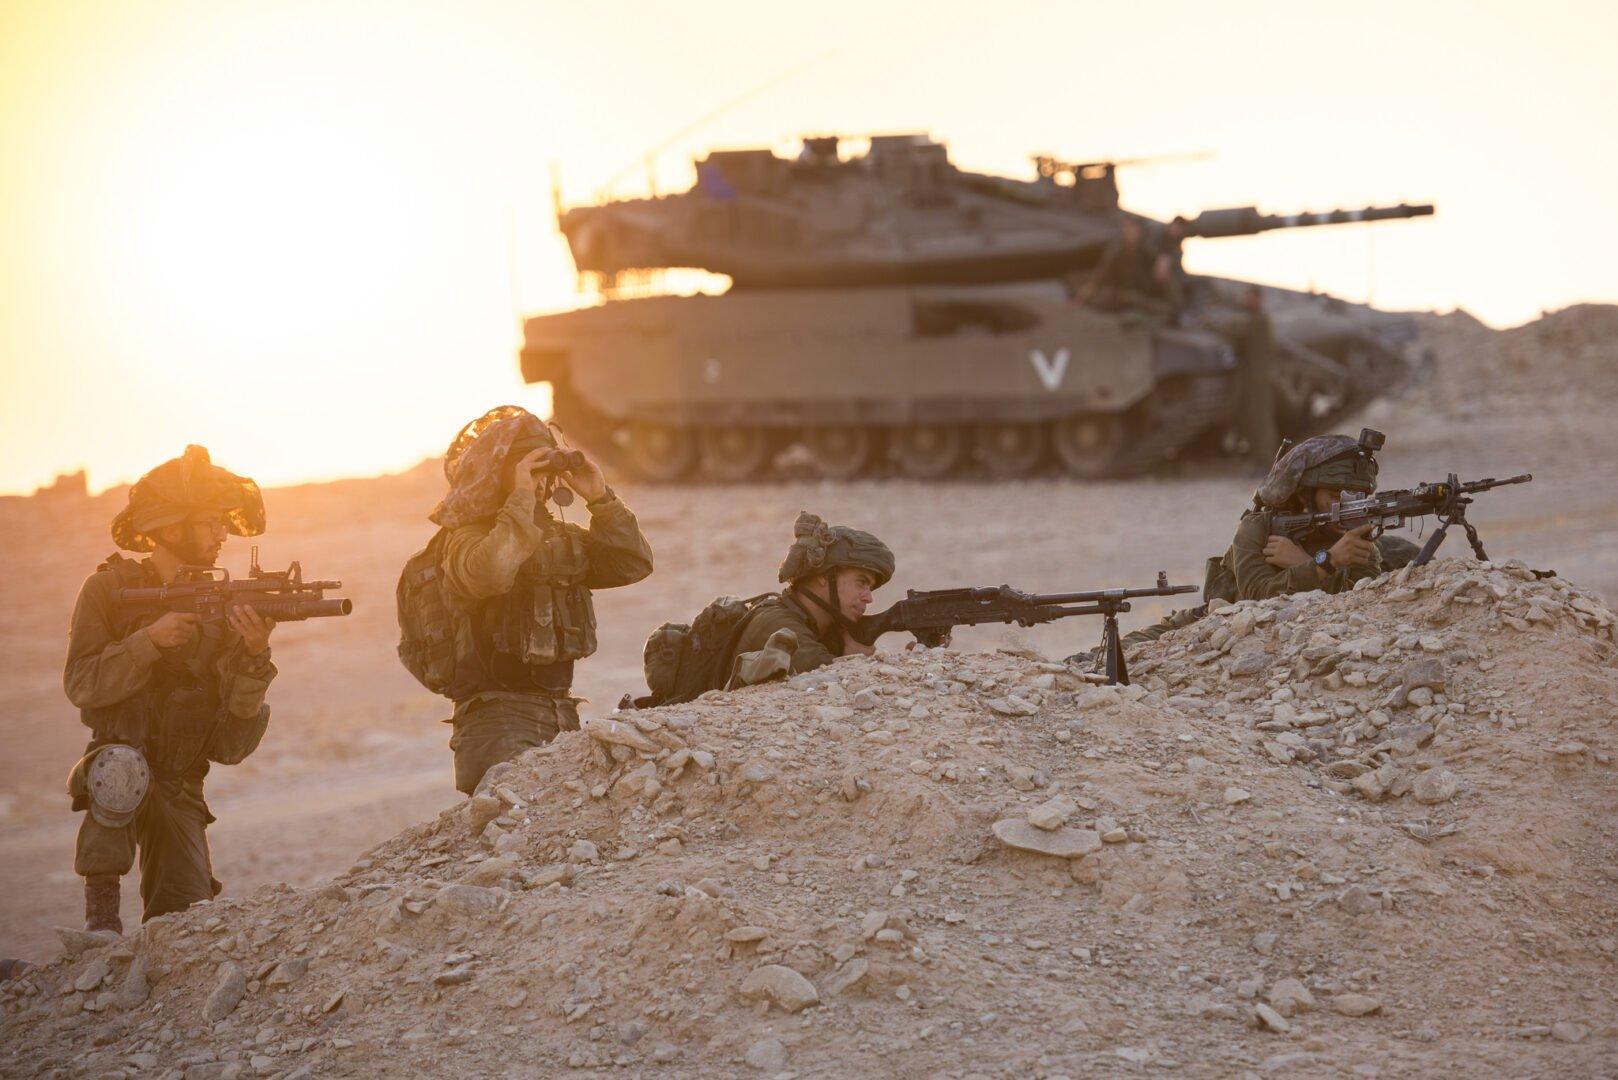 IDF – ΚΙΝΔΥΝΟΣ Η ΤΟΥΡΚΙΑ , ΕΝΟΧΛΕΙ ΤΗΝ ΣΥΜΜΑΧΟ ΕΛΛΑΔΑ